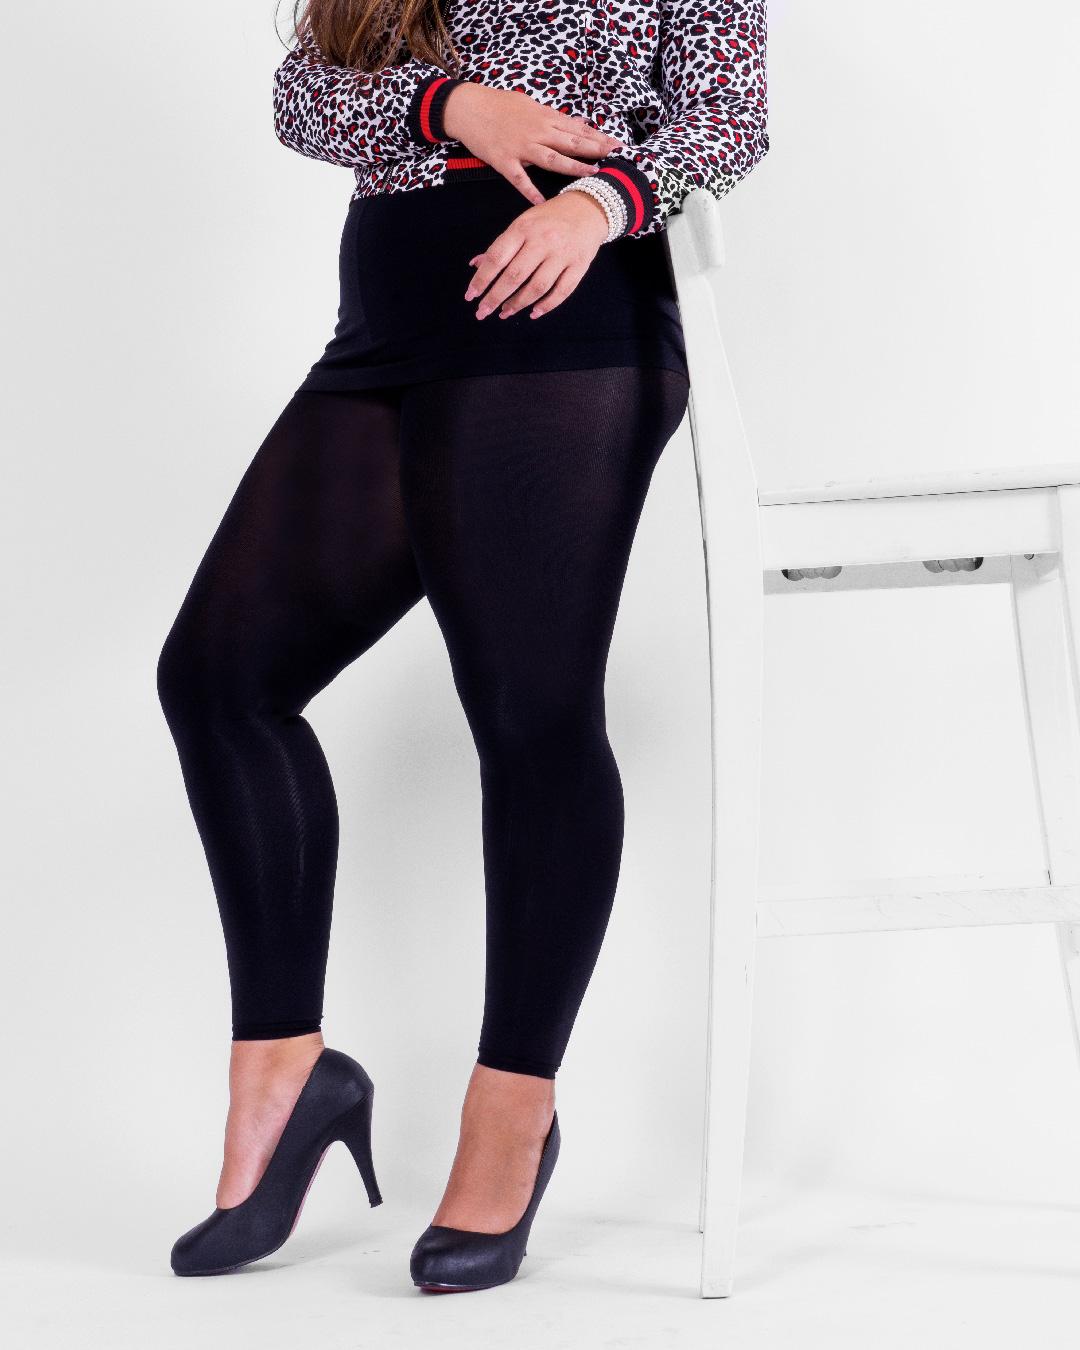 personalsize-exclusive-leggings-exclusive-prd_001.jpg